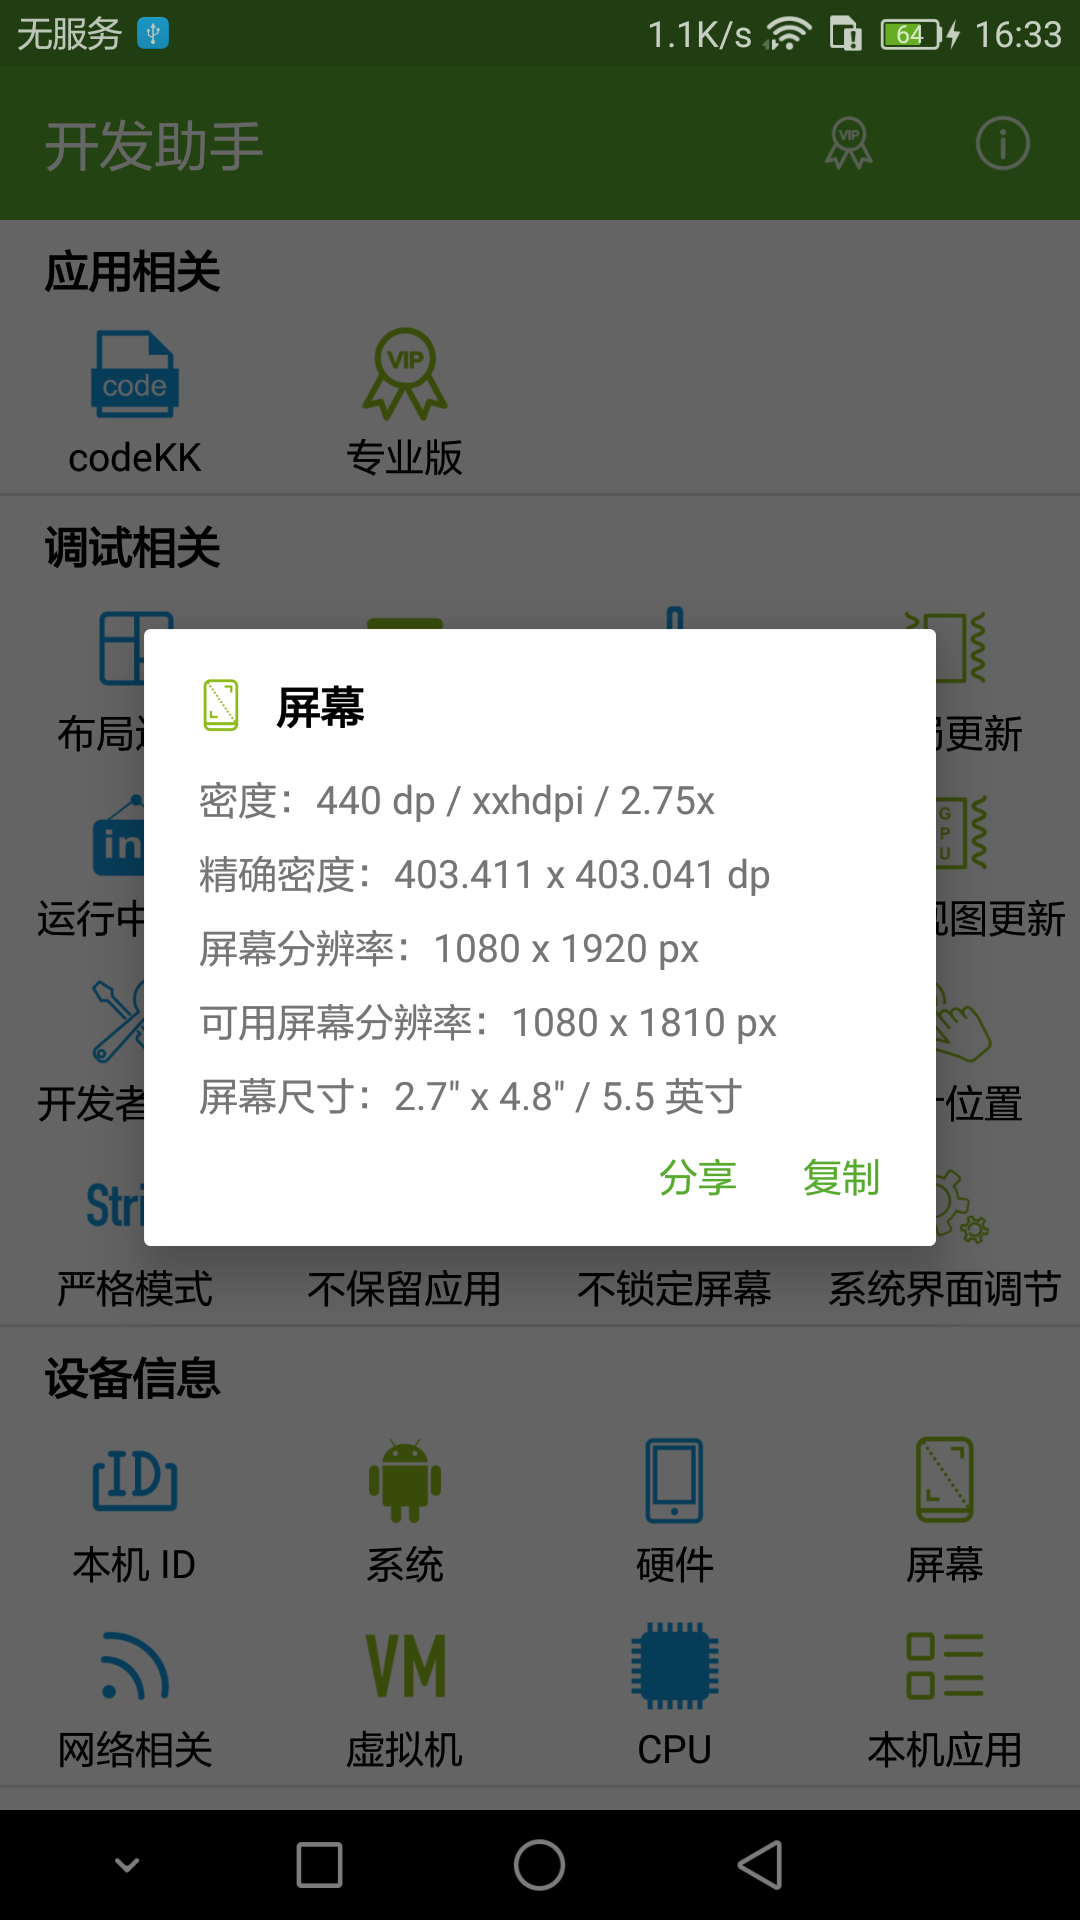 screenshot_2018-09-28-16-33-48